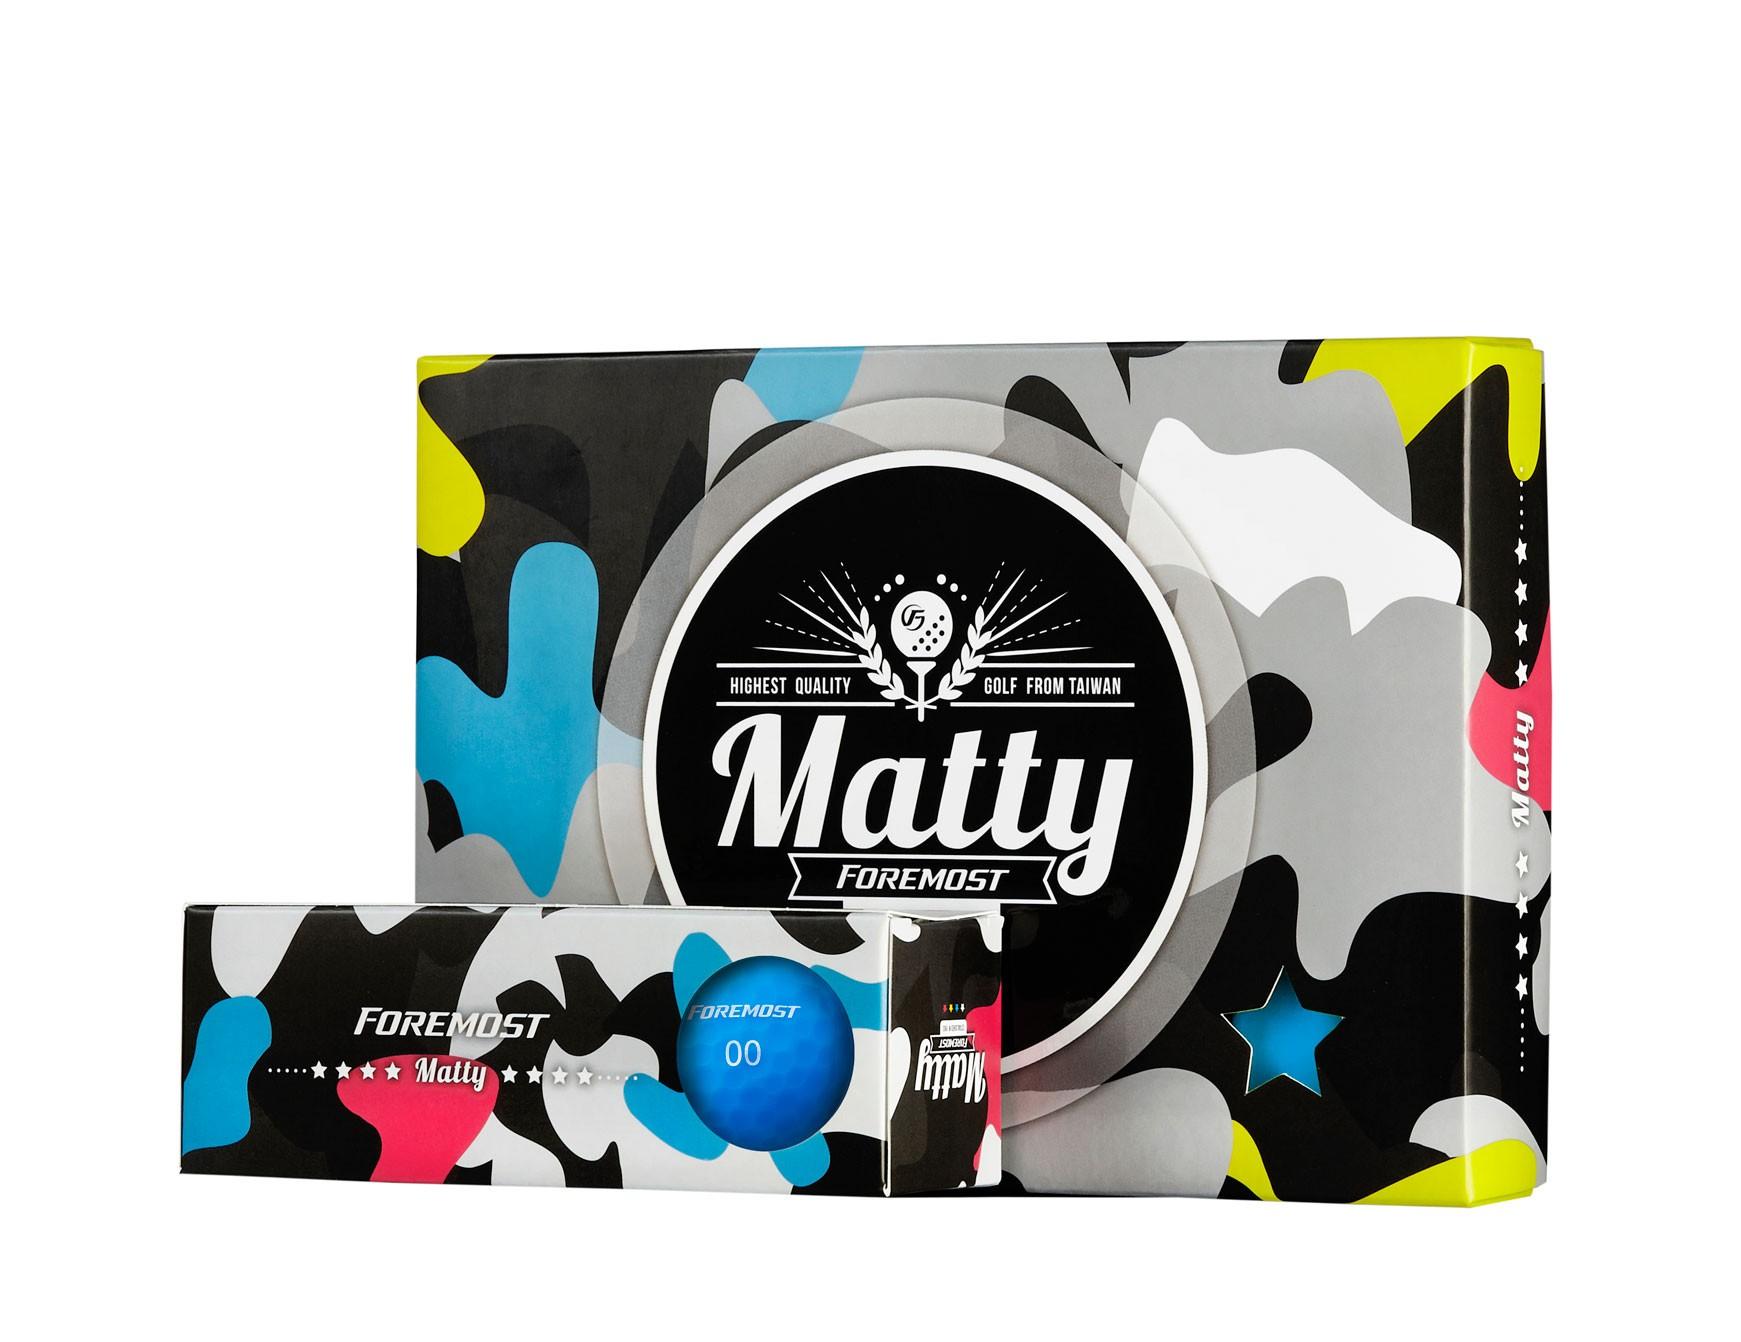 Matty 特霧消光球 - 瑩光藍